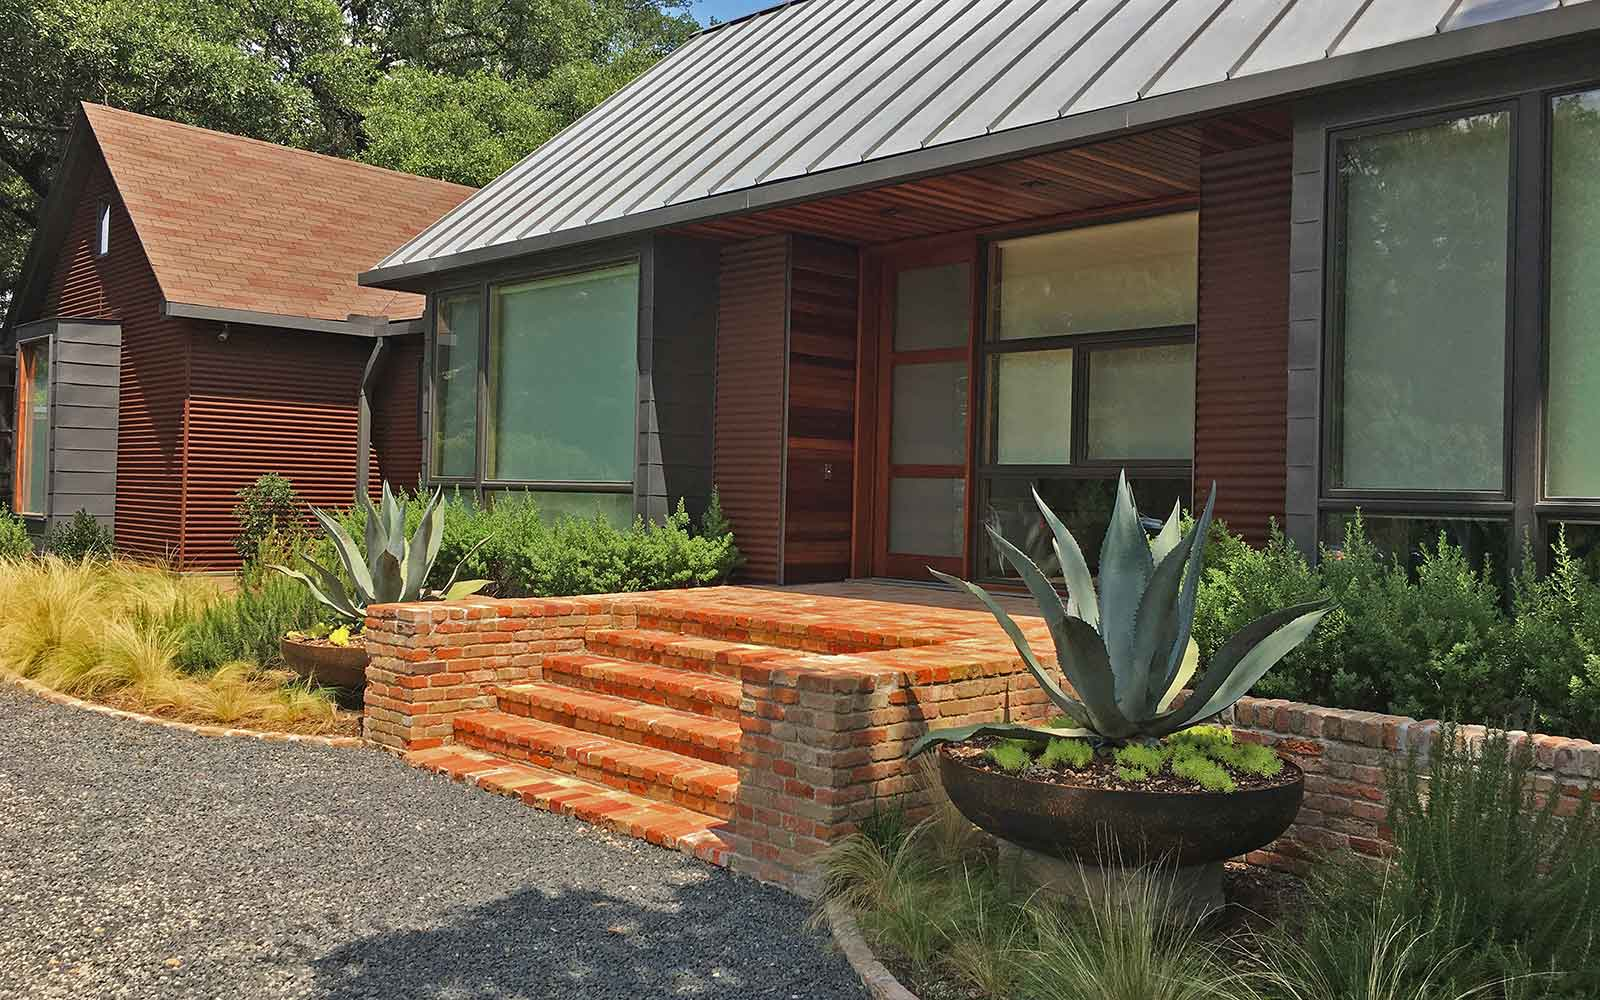 preston hollow drought-tolerant landscape design